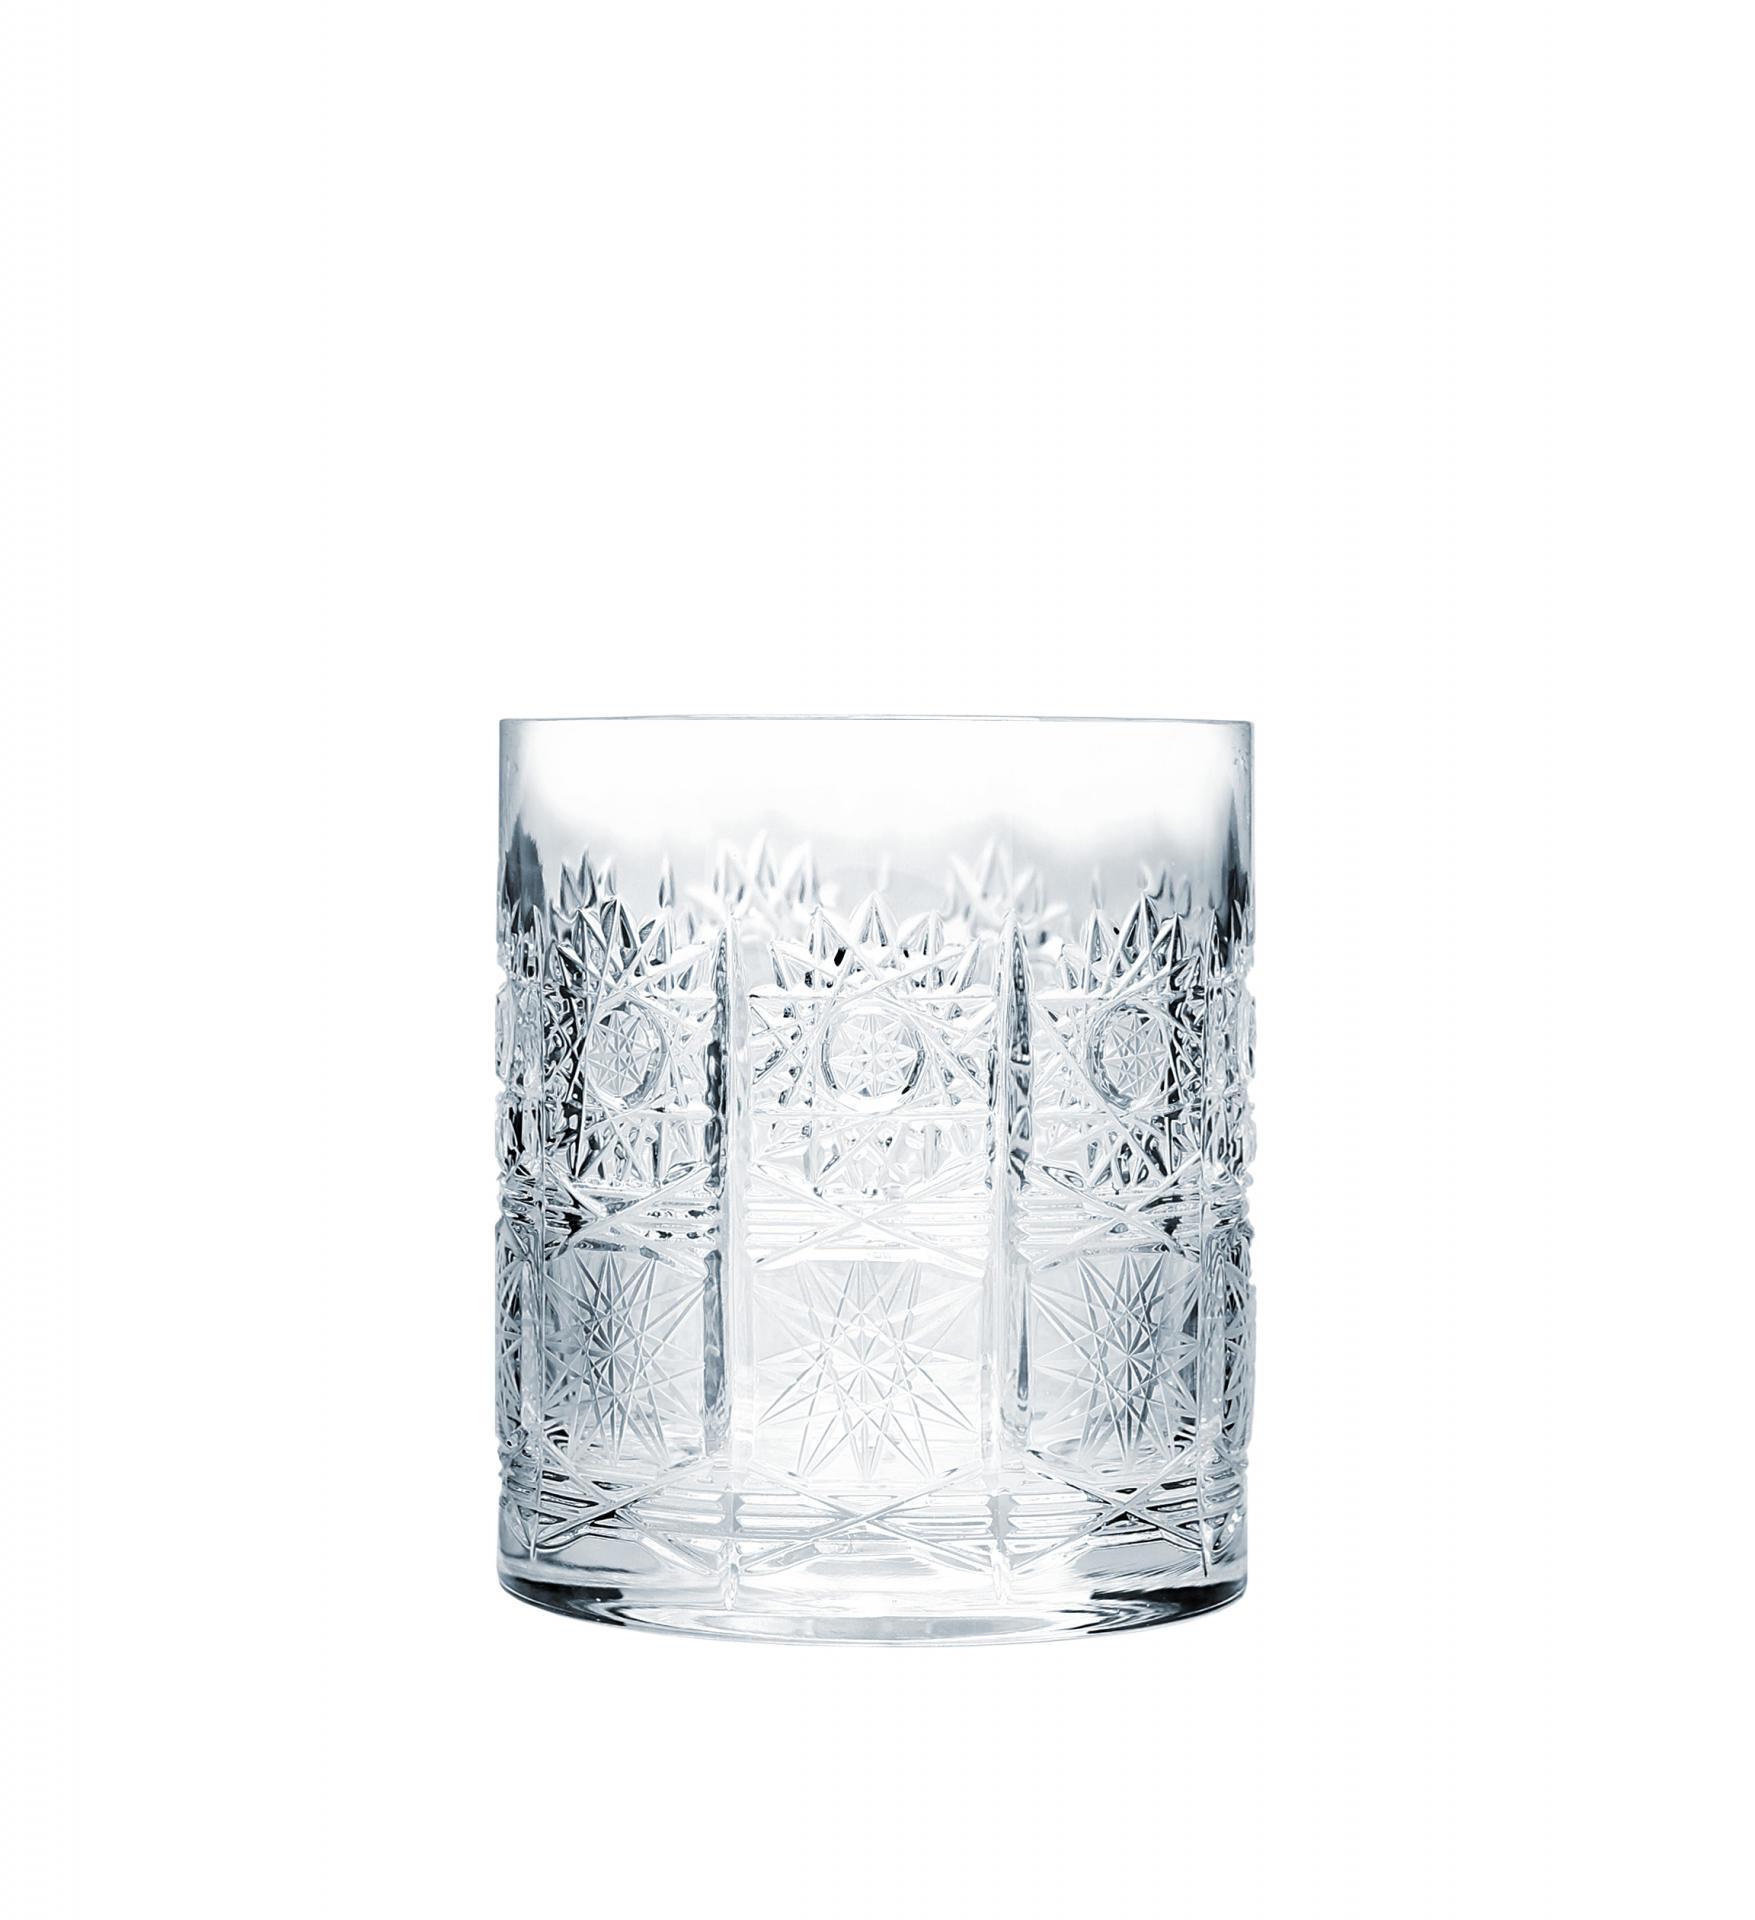 CRYSTAL BOHEMIA Broušená křišťálová sklenice na whisky Crystal BOHEMIA 3,3 dcl, čirá barva, sklo